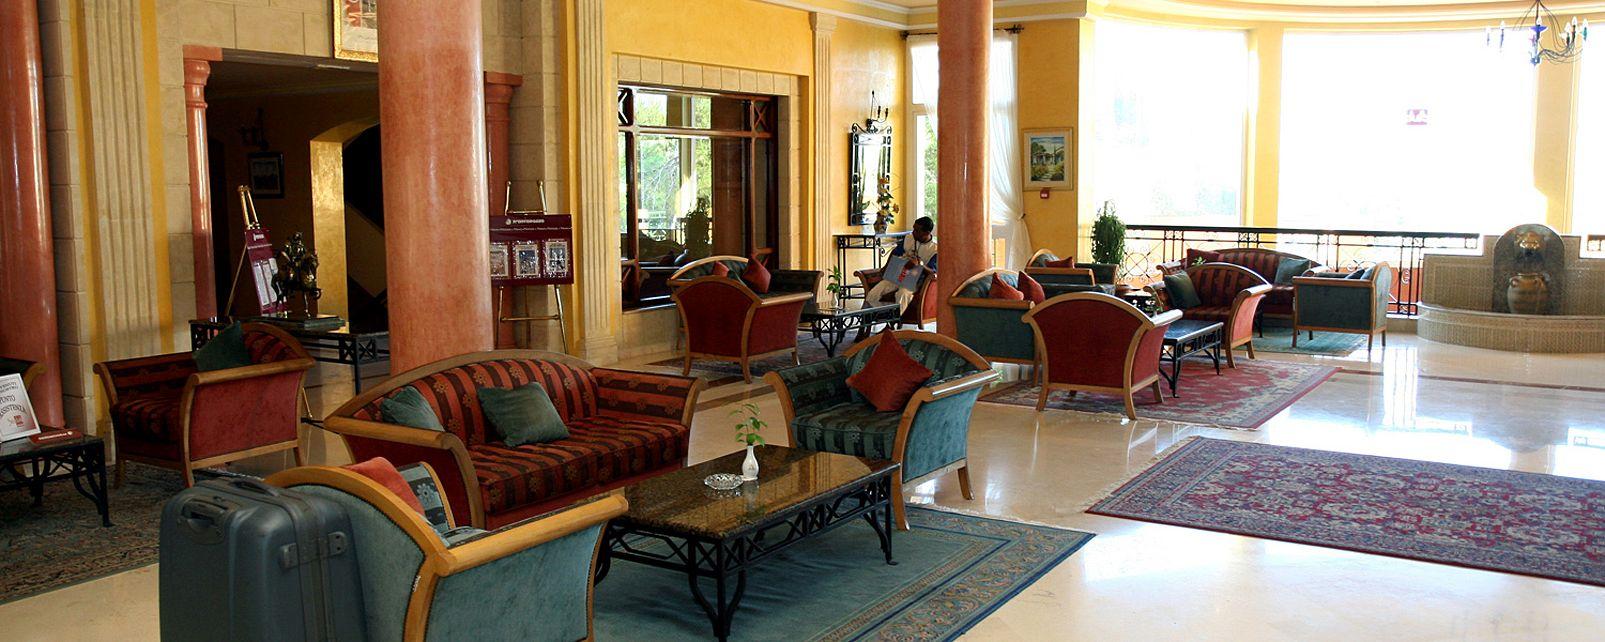 Hôtel Dar Ismail